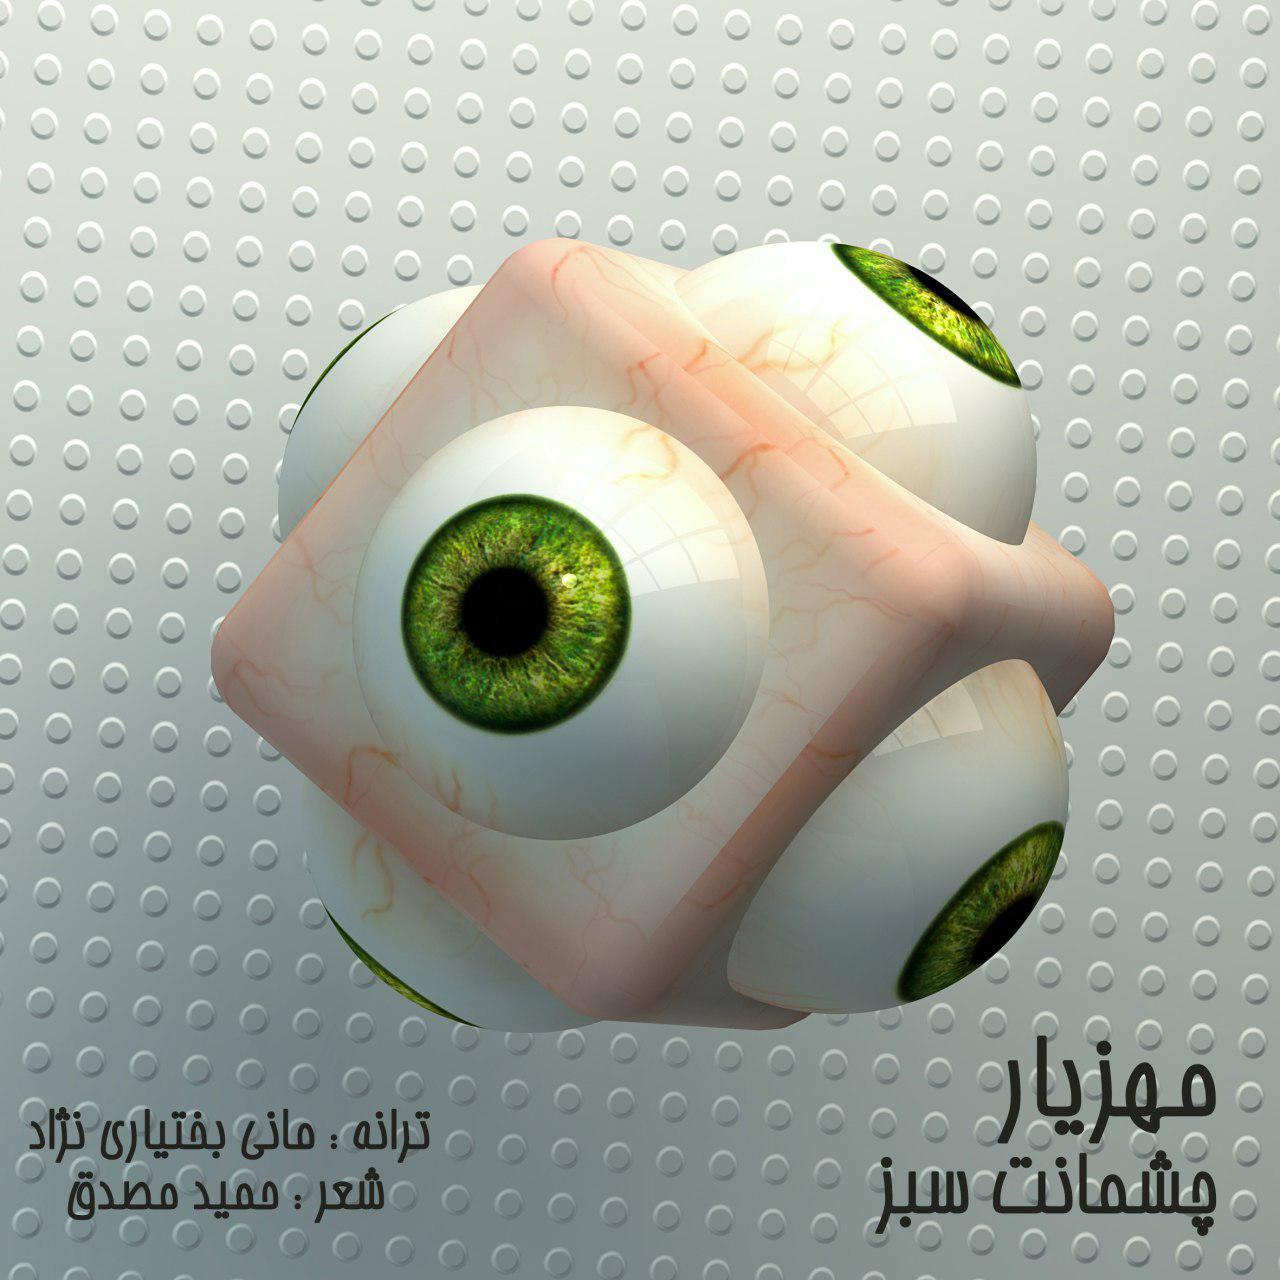 Mahzyar – Green Eyes (Demo)